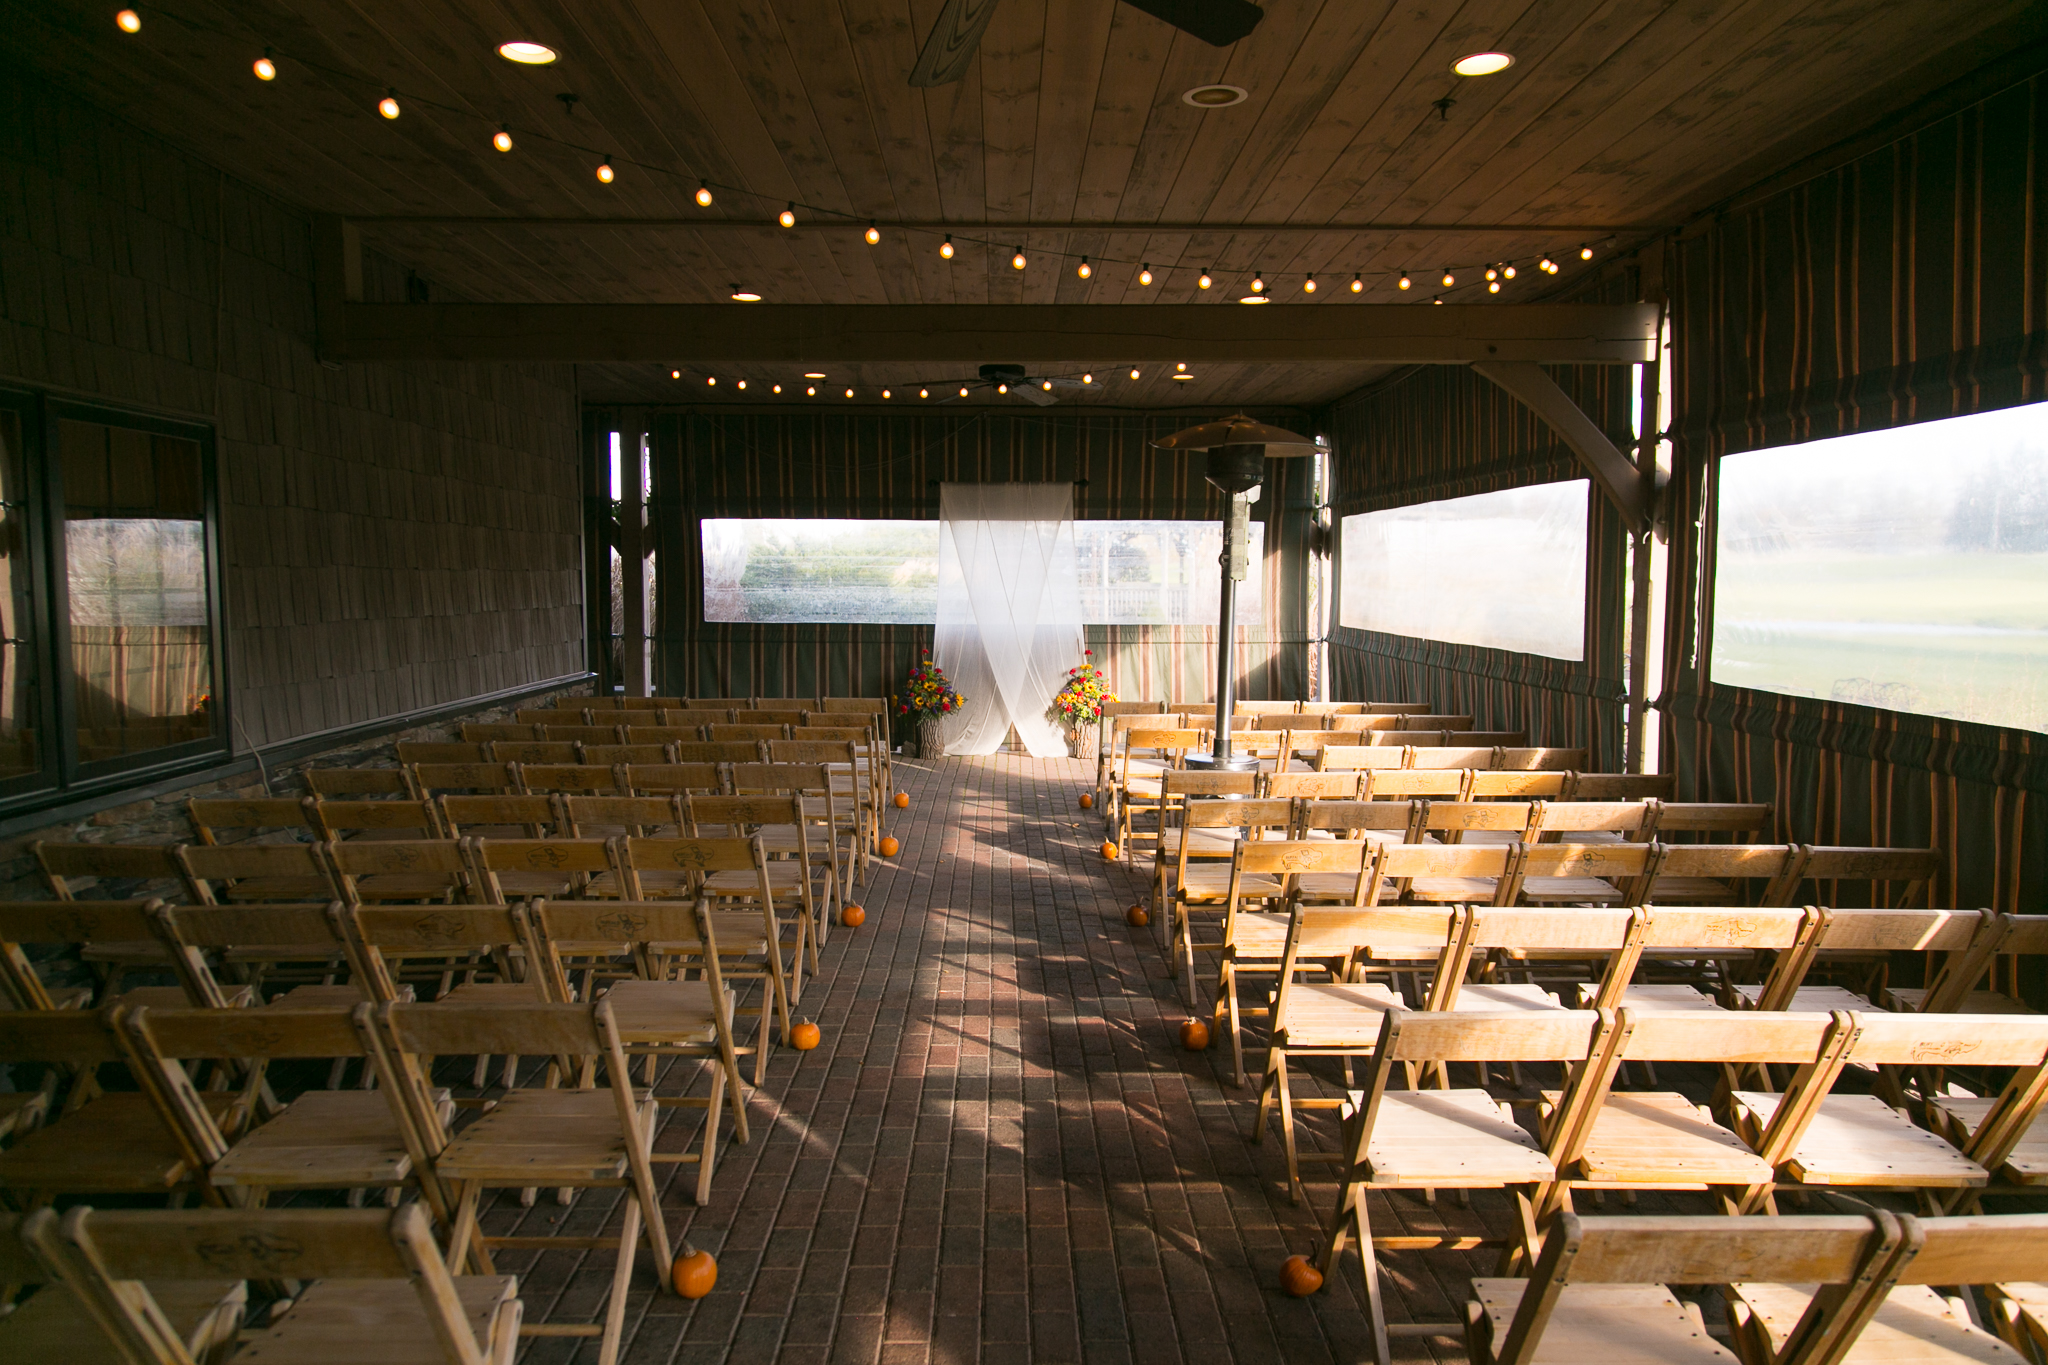 camuglia-whomstudio-chelsea_and_andy-nycphotographer-wedding-brooklyn-buffalo-timberlodge-009-5237.jpg